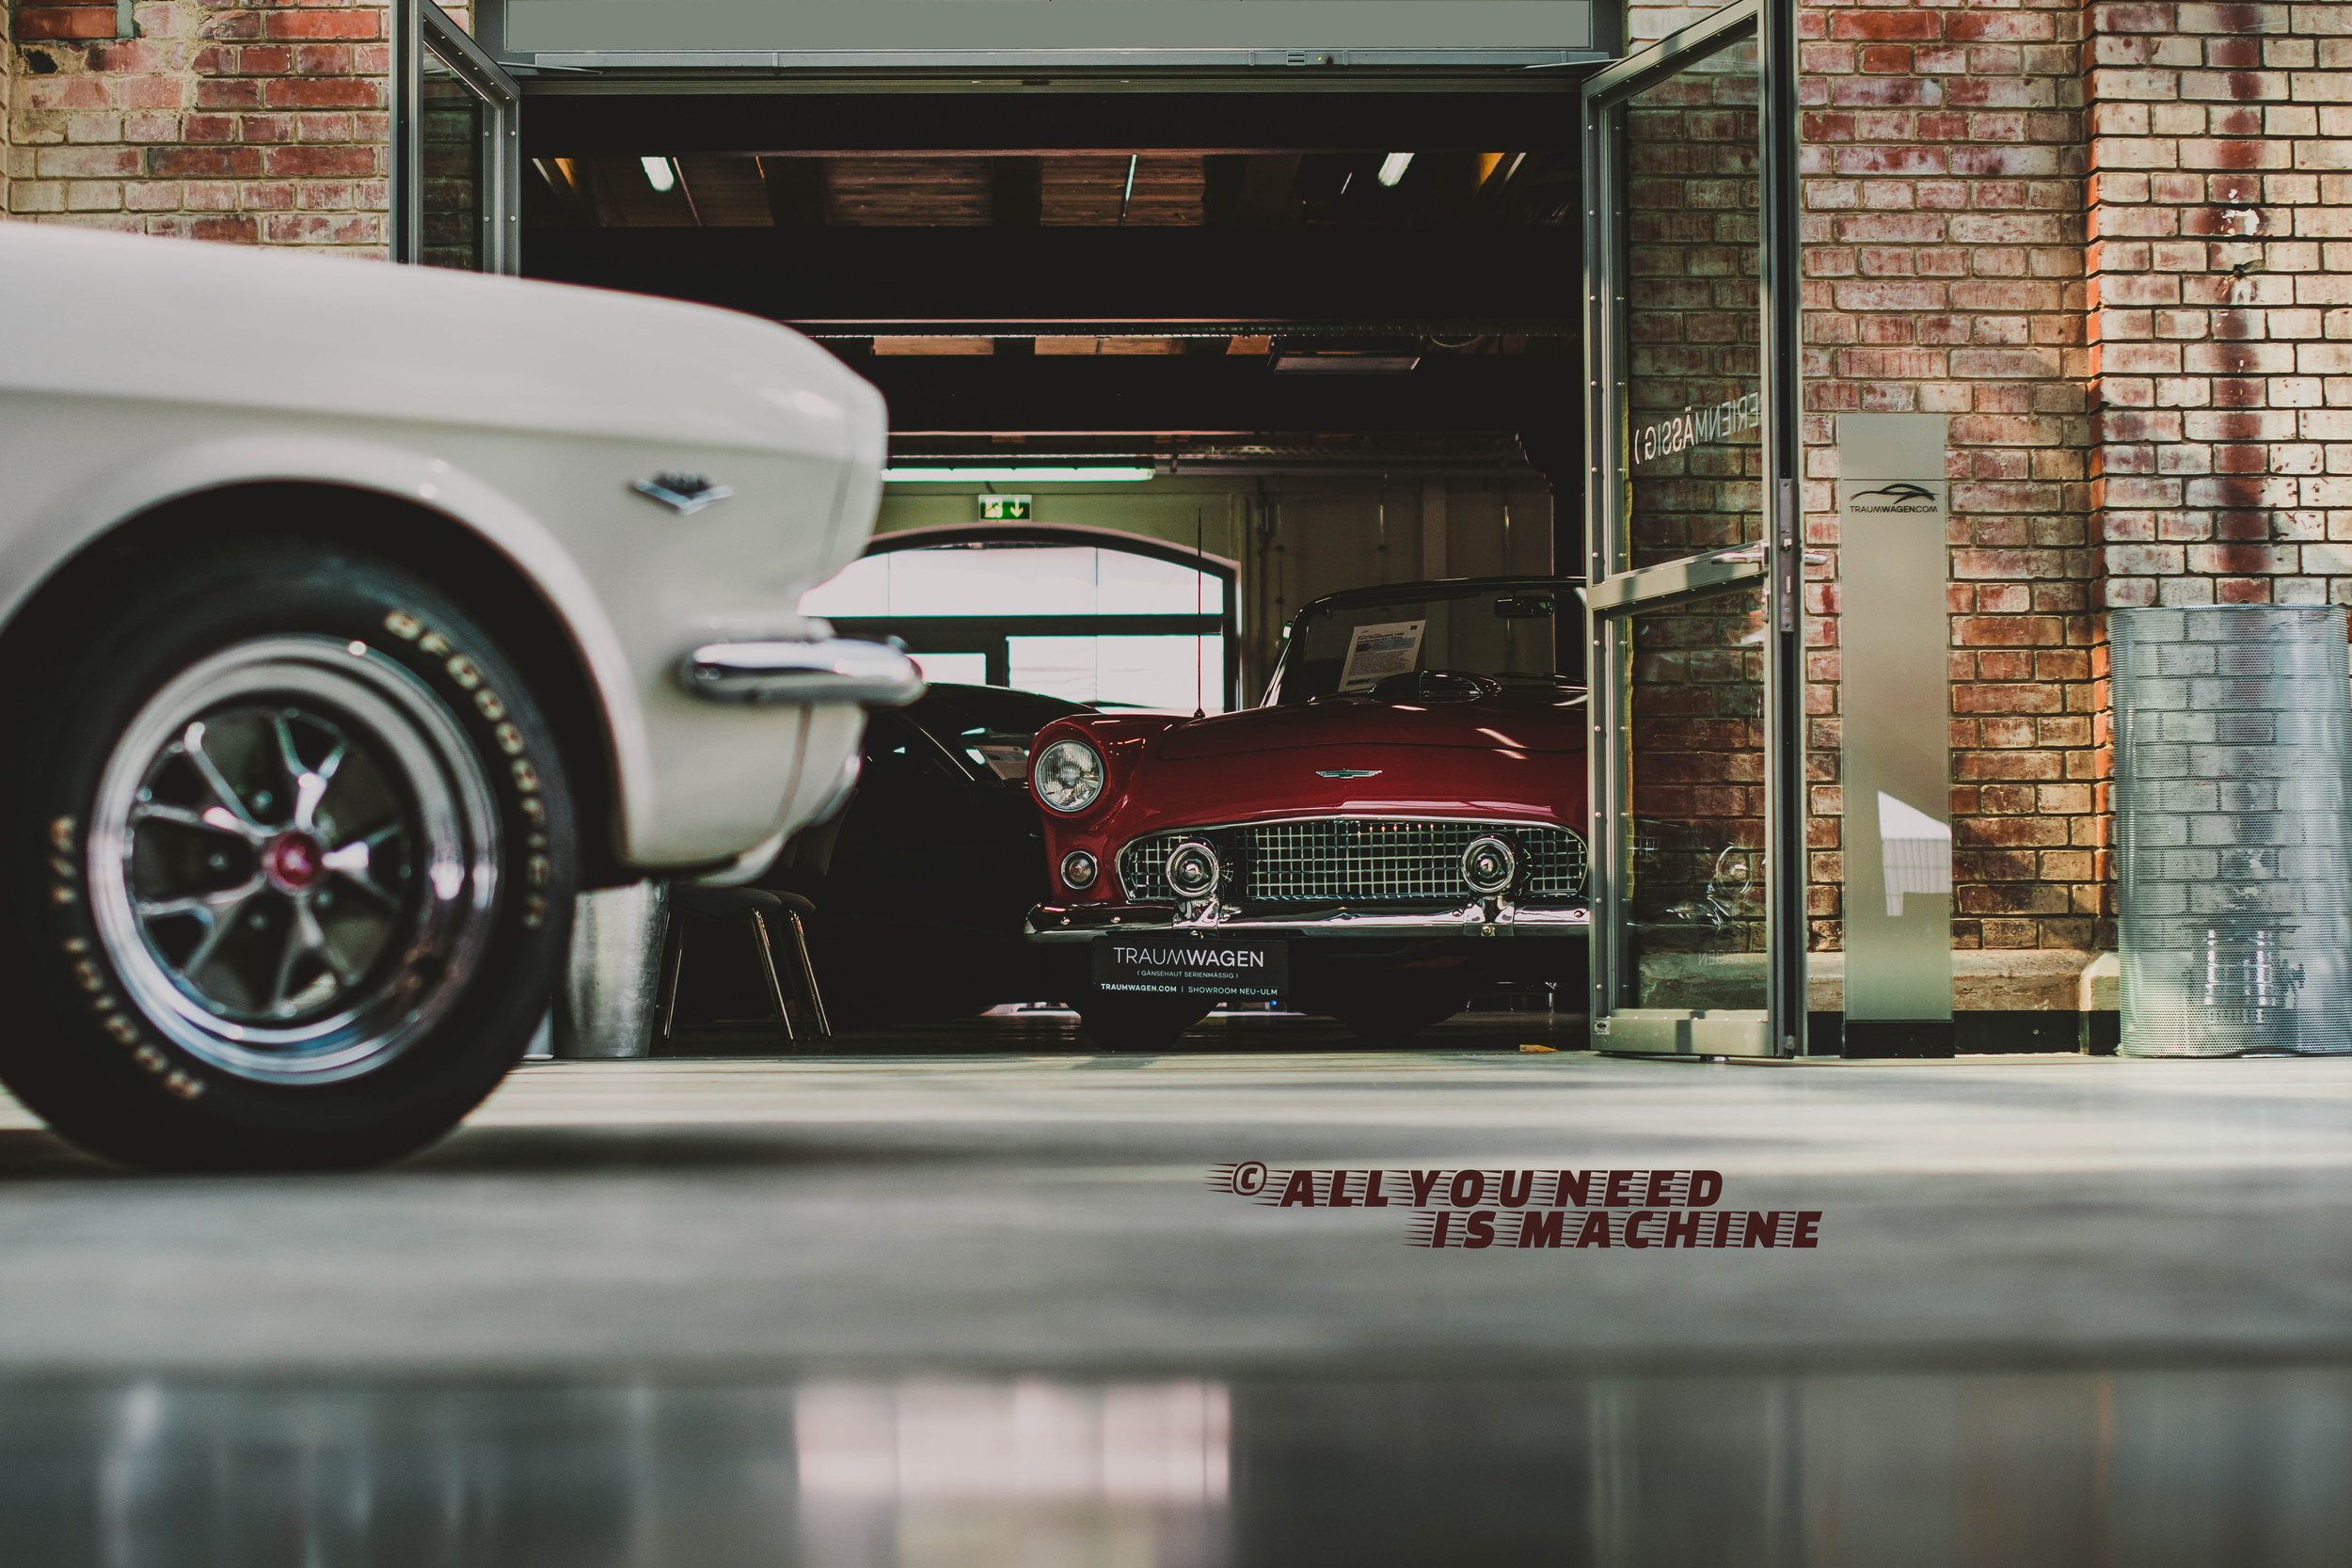 Ford Thunderbird '56 from Germany Neu-Ulm Oldtimerfabrik Classic Halle